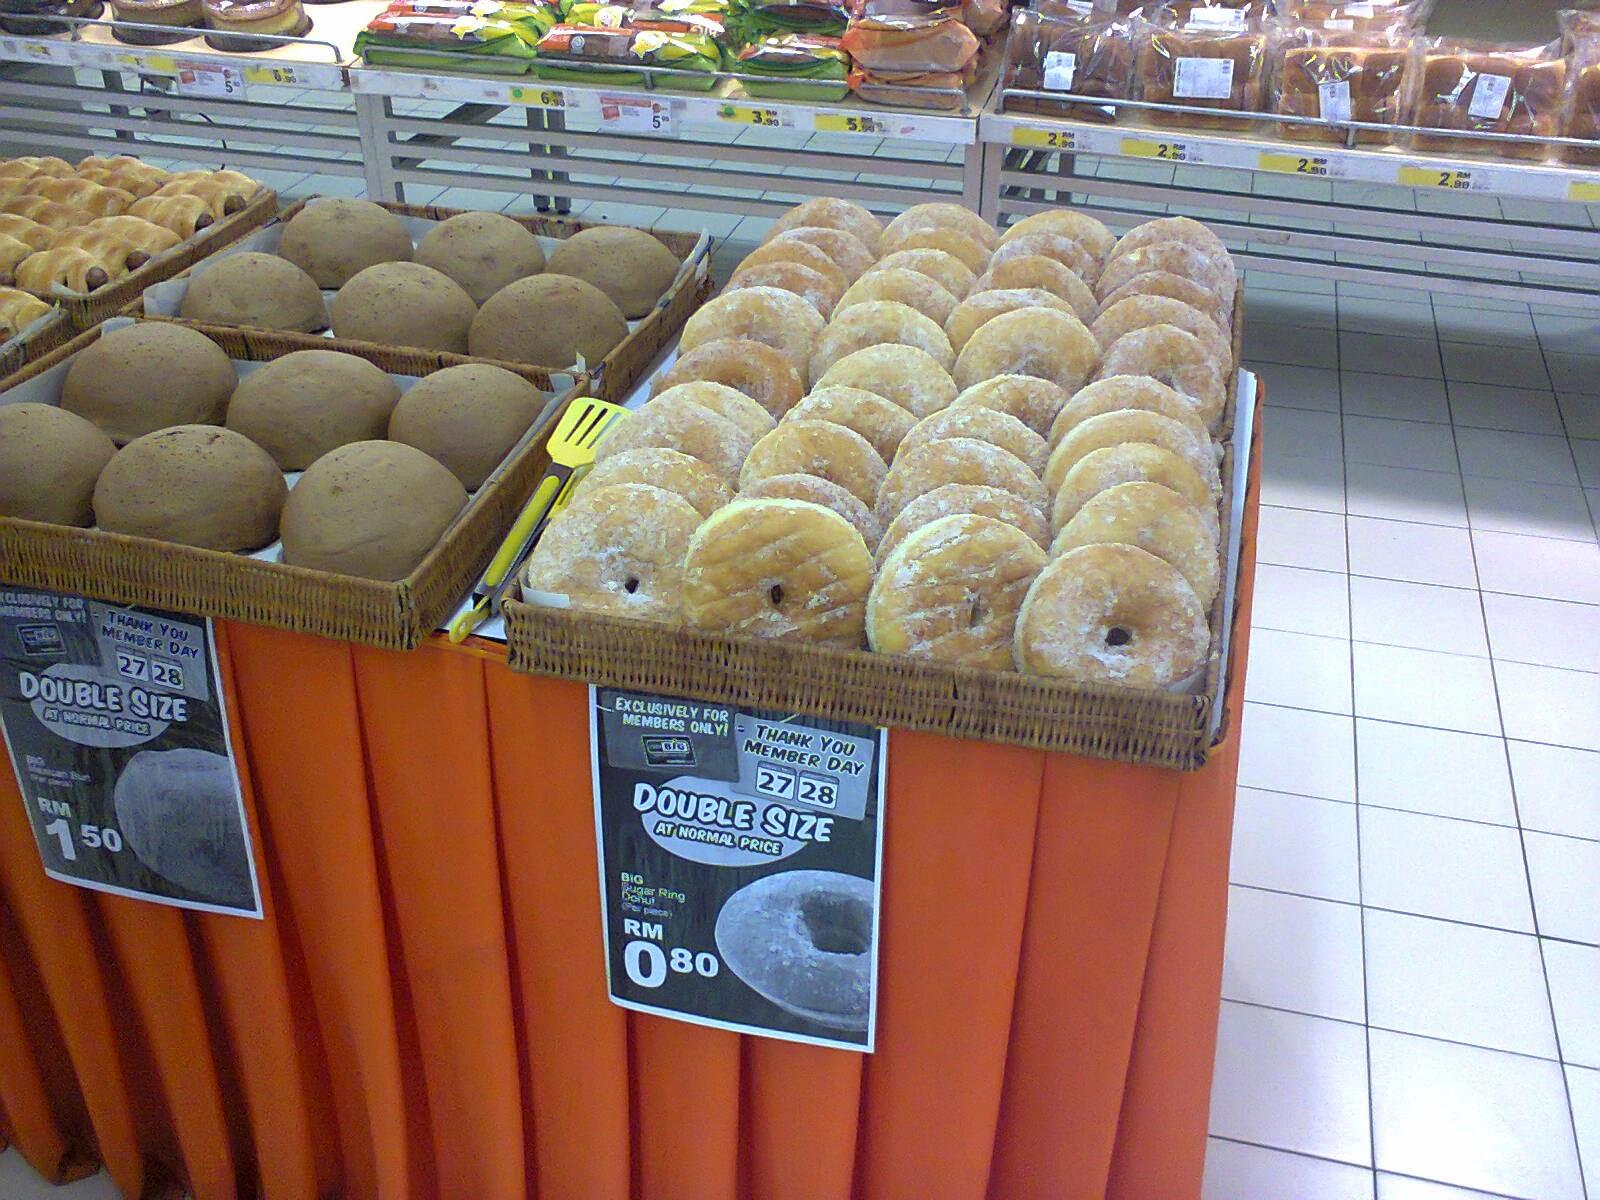 Donut Gergasi hanya RM 0 80